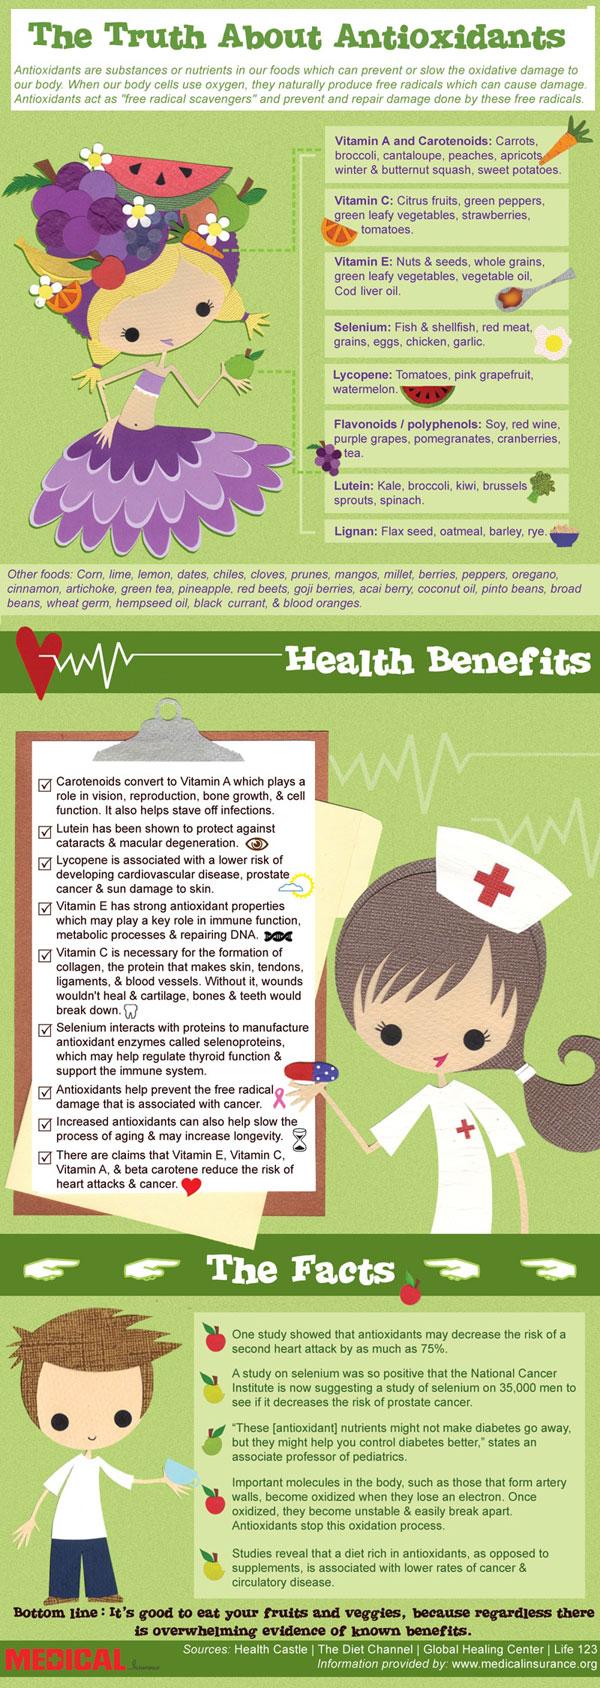 14 Benefits Of Antioxidants Infographic